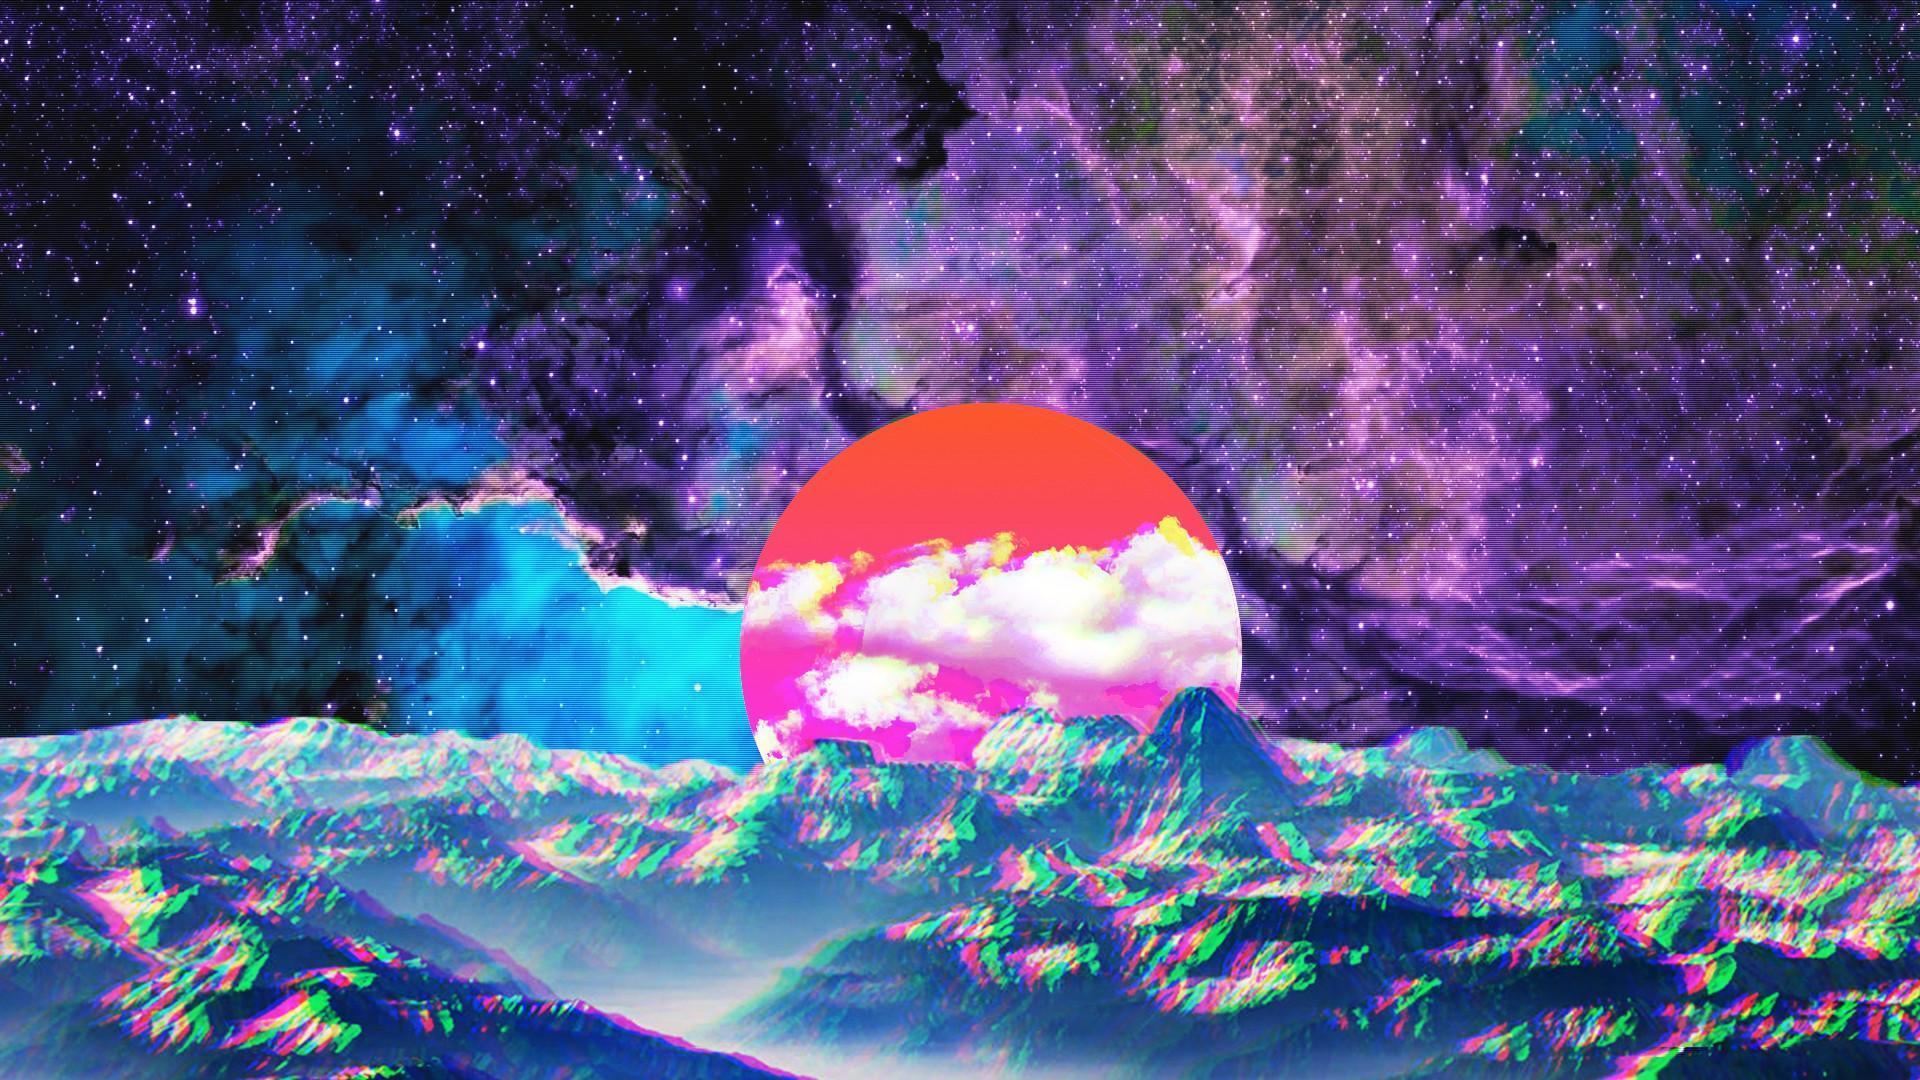 Aesthetics Full Screen Wallpapers Wallpaper Cave